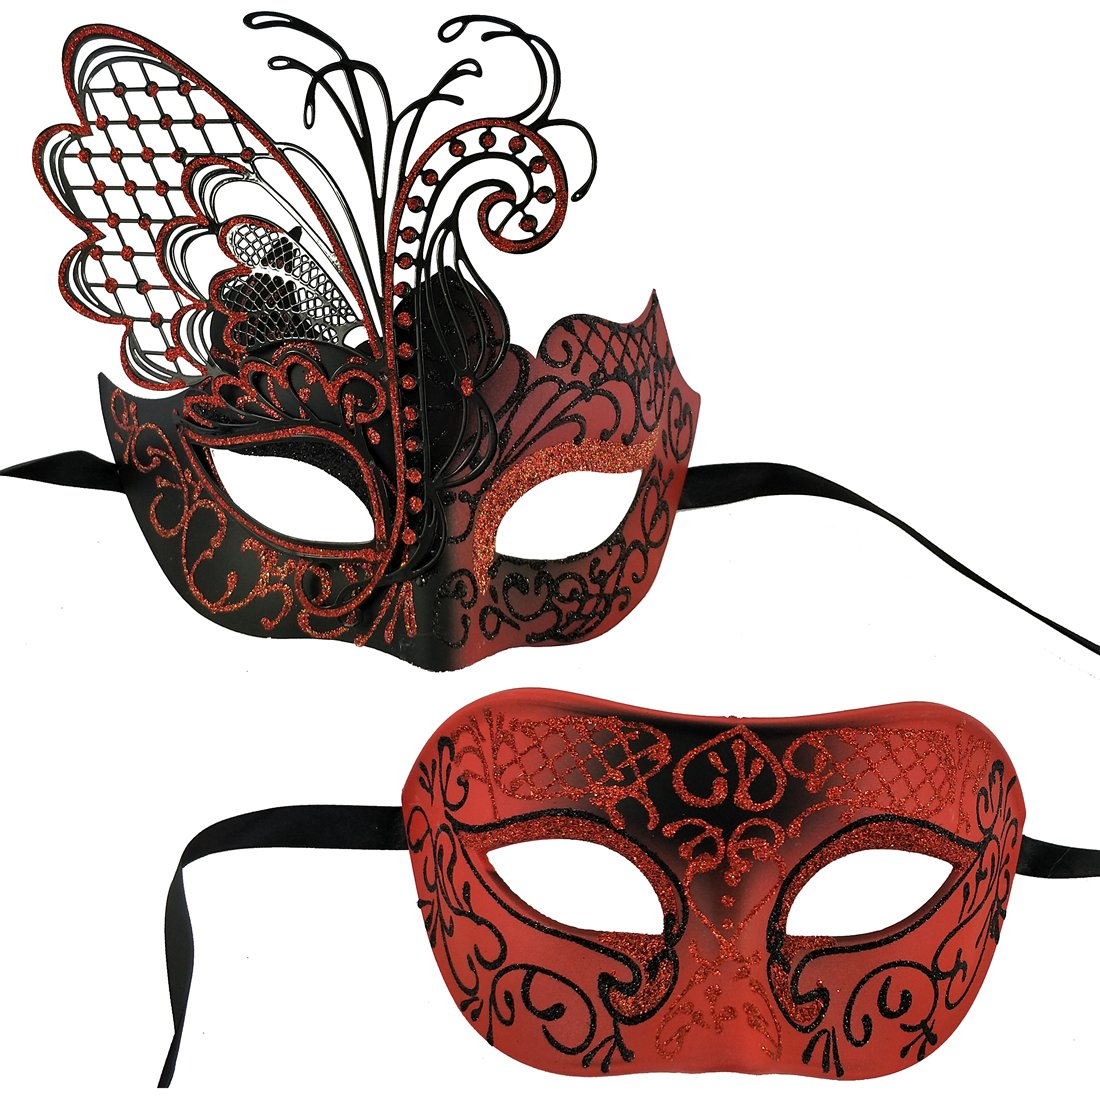 Xvevina Couples Pair Mardi Gras Venetian Masquerade Masks Set Party Costume Accessory (Red Black Couples)